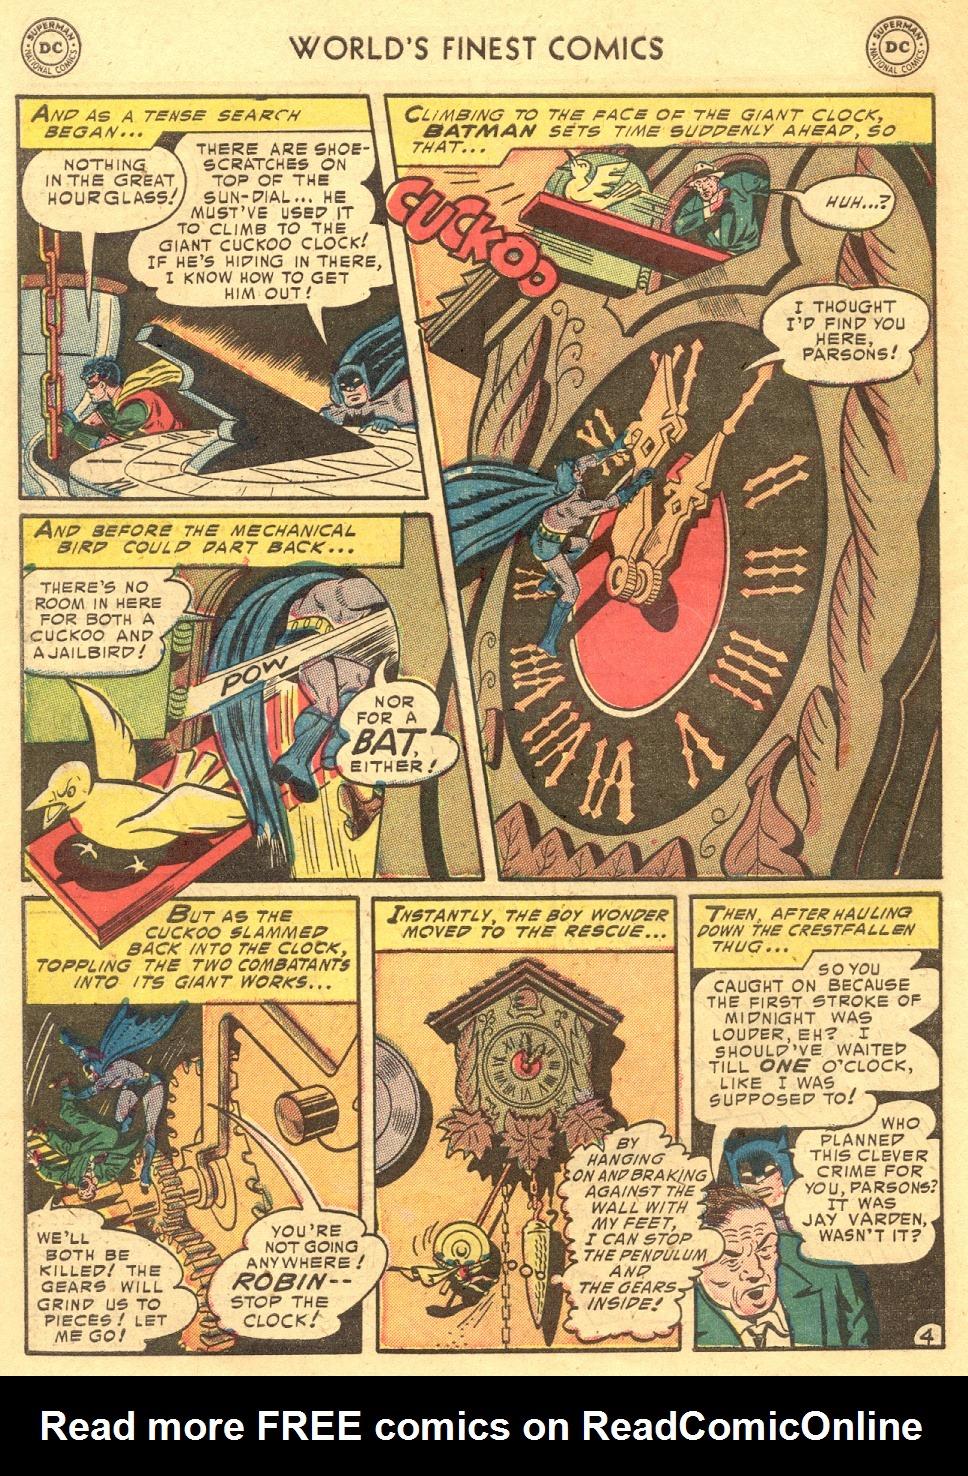 Read online World's Finest Comics comic -  Issue #70 - 58